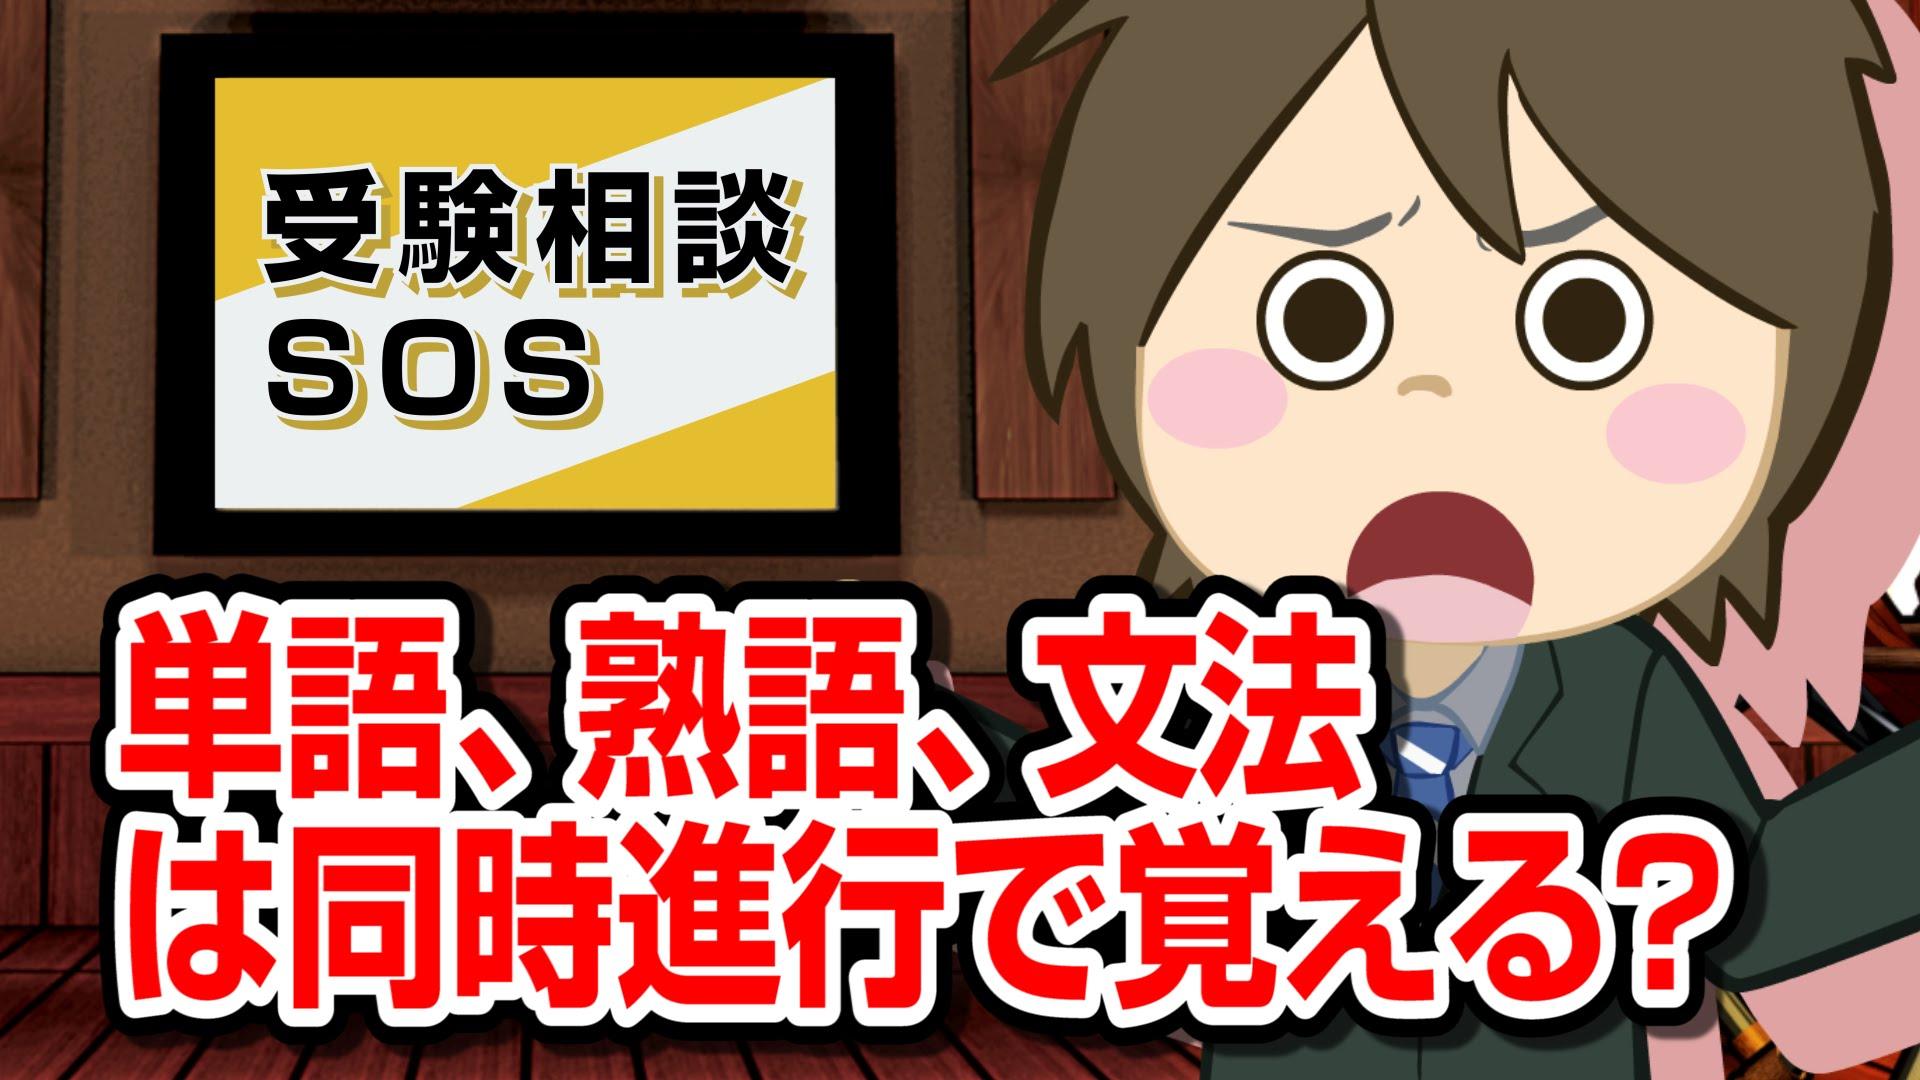 【vol.98】単語熟語文法は同時進行!? 受験相談SOS